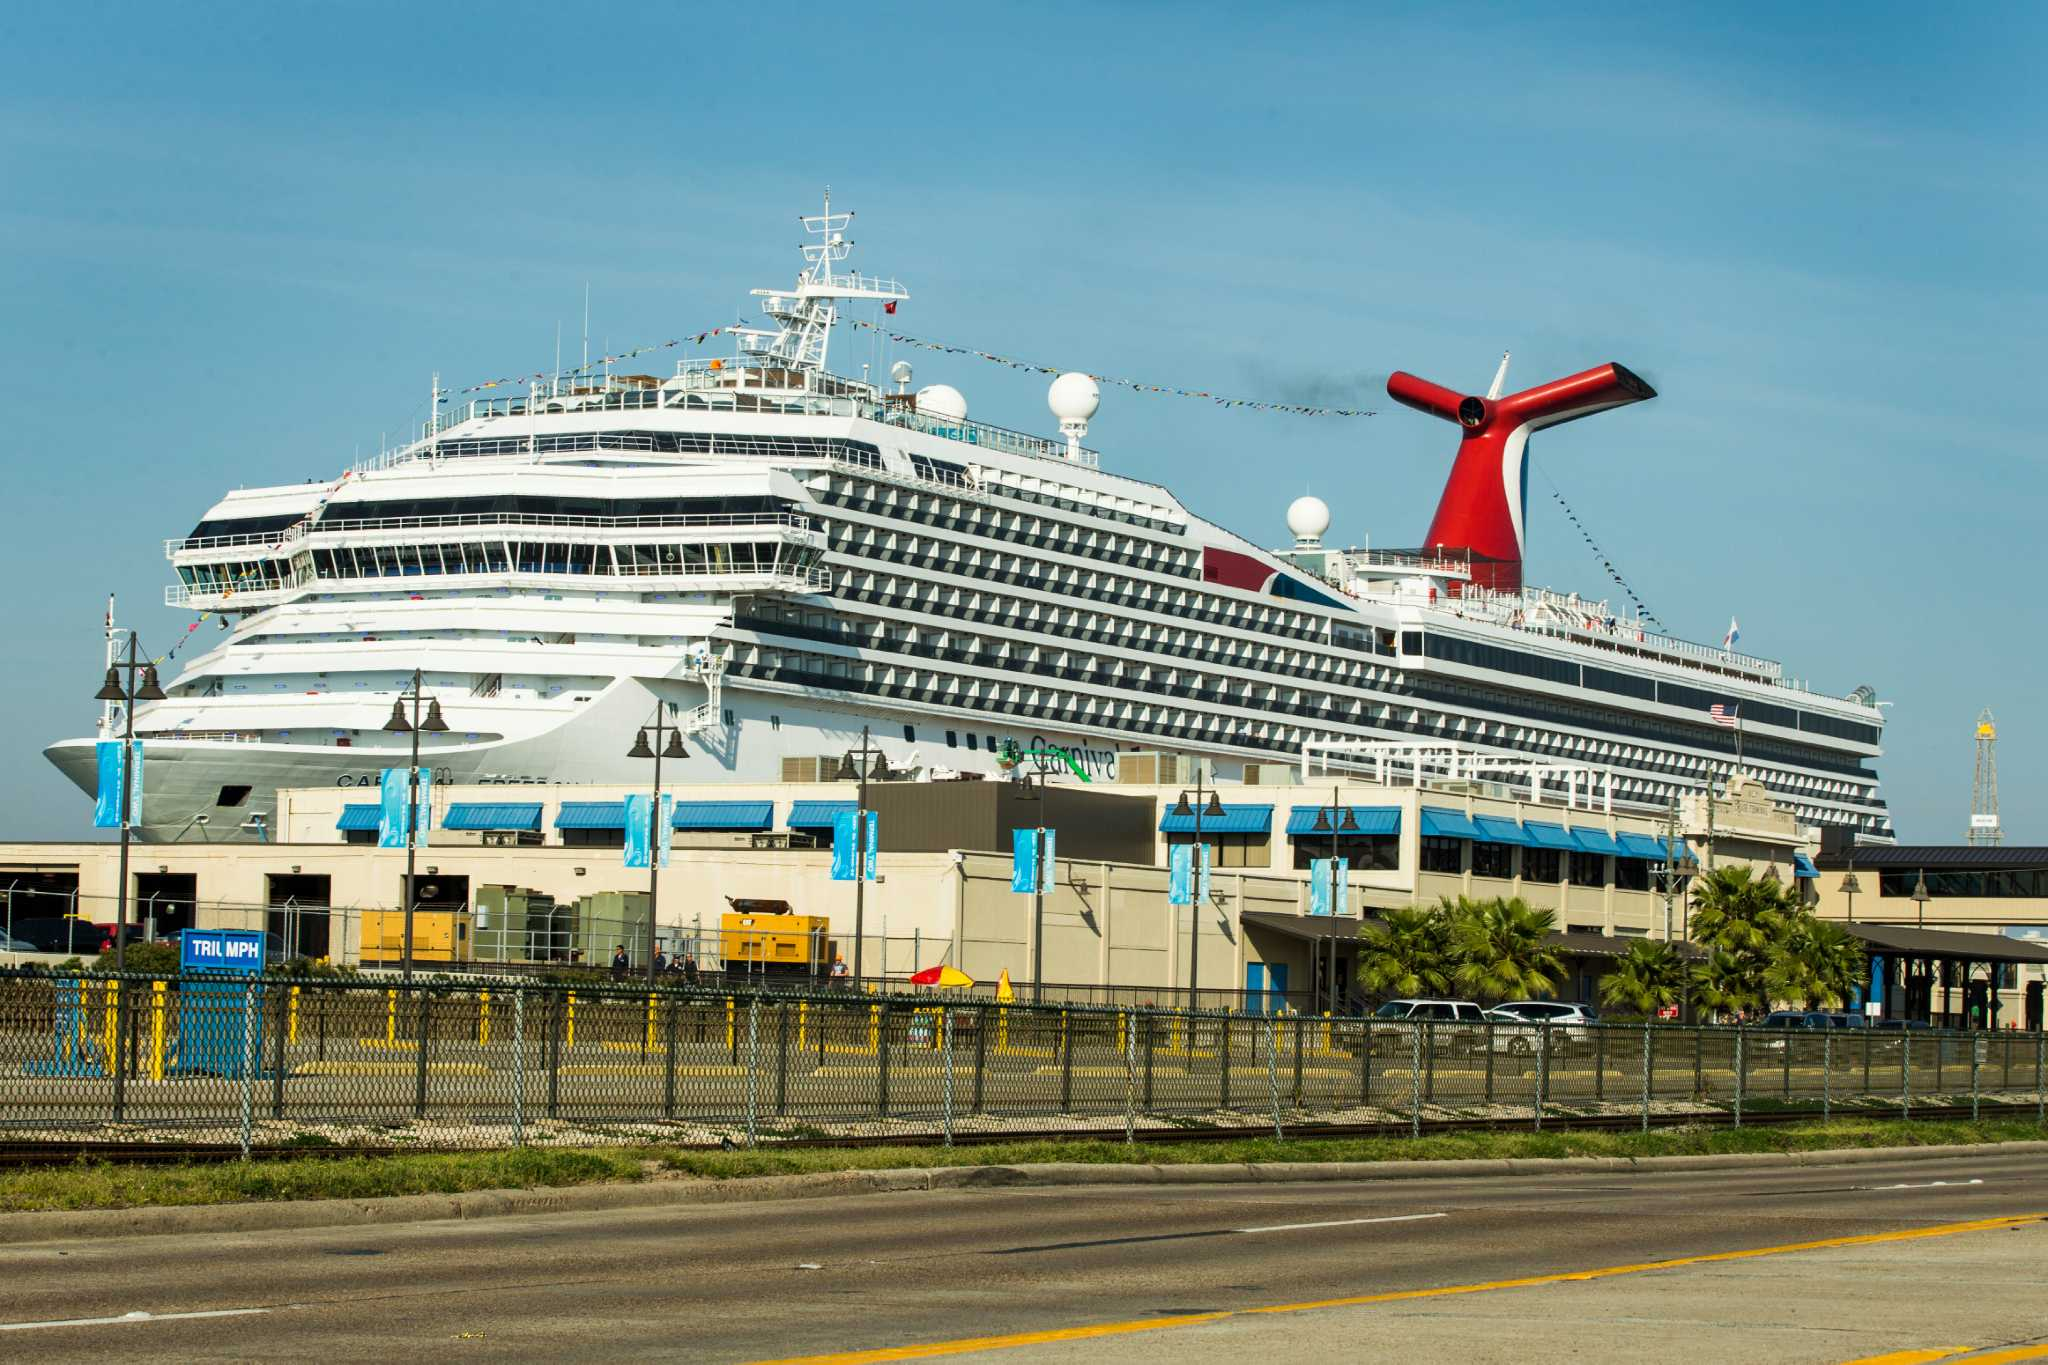 Texas Cruises